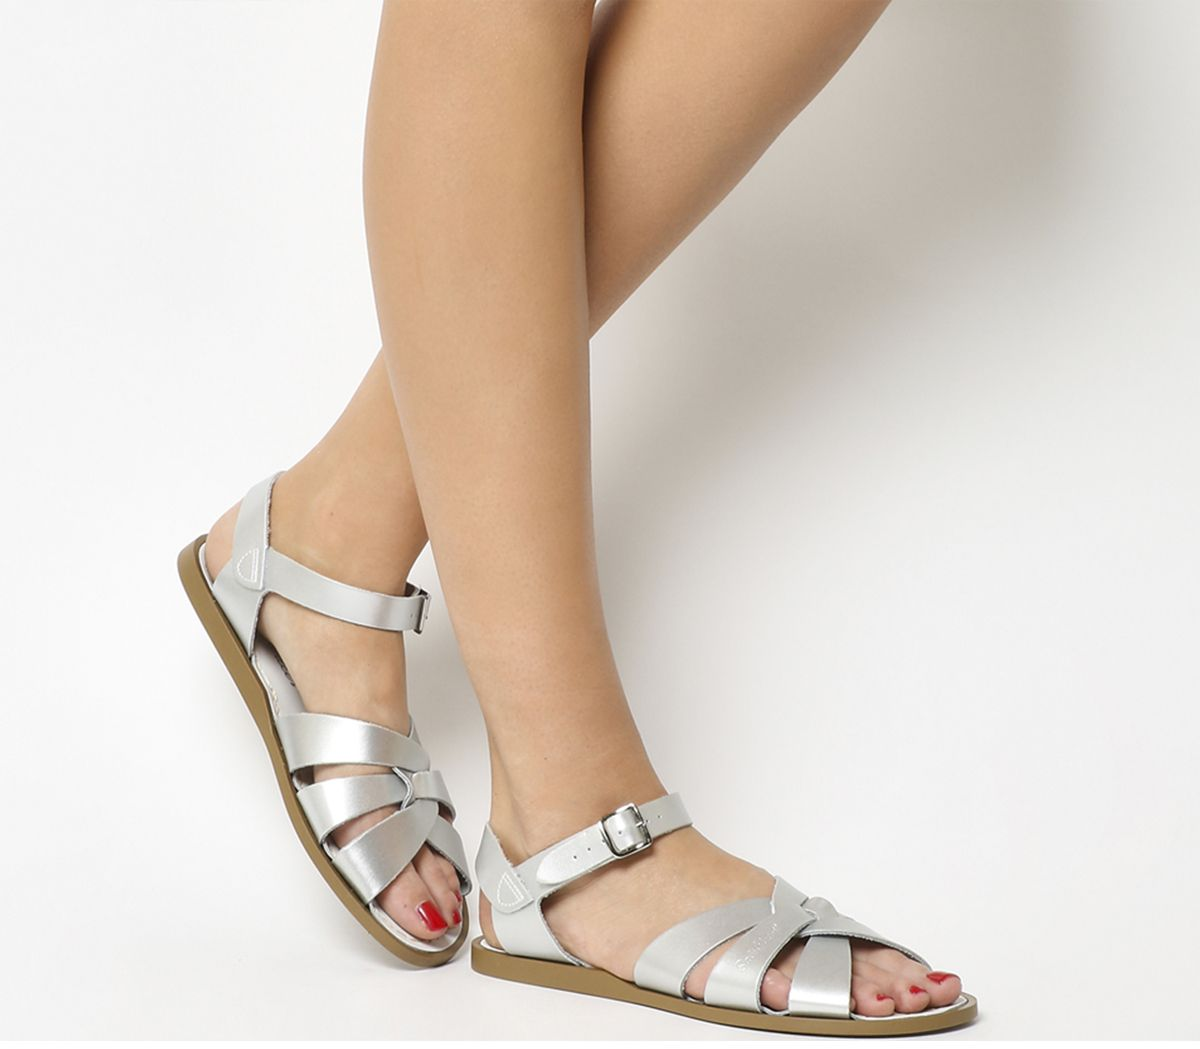 5c89cdc7bd5 Salt Water Original Sandals Silver Leather - Sandals